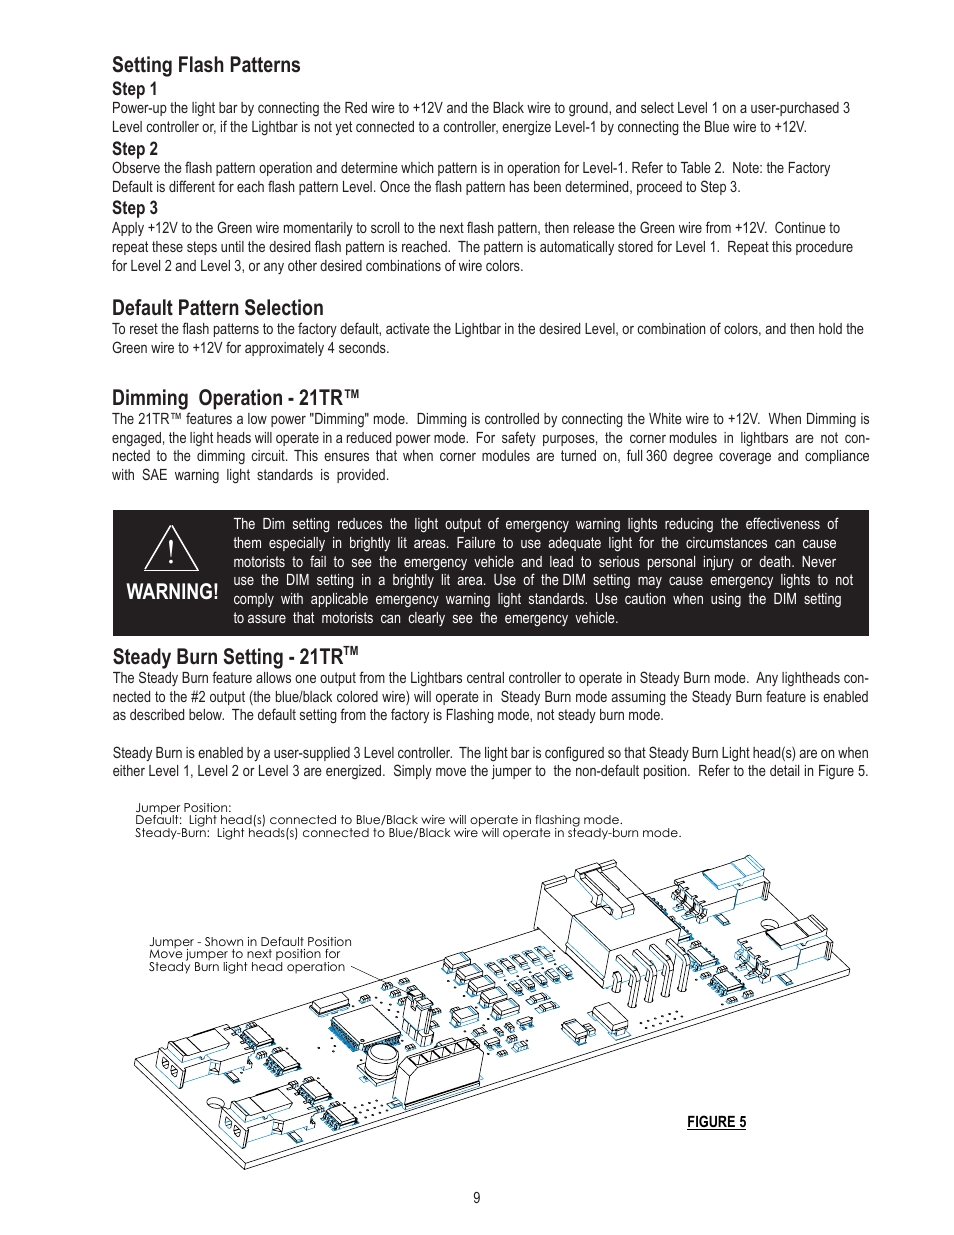 setting flash patterns default pattern selection dimming. Black Bedroom Furniture Sets. Home Design Ideas